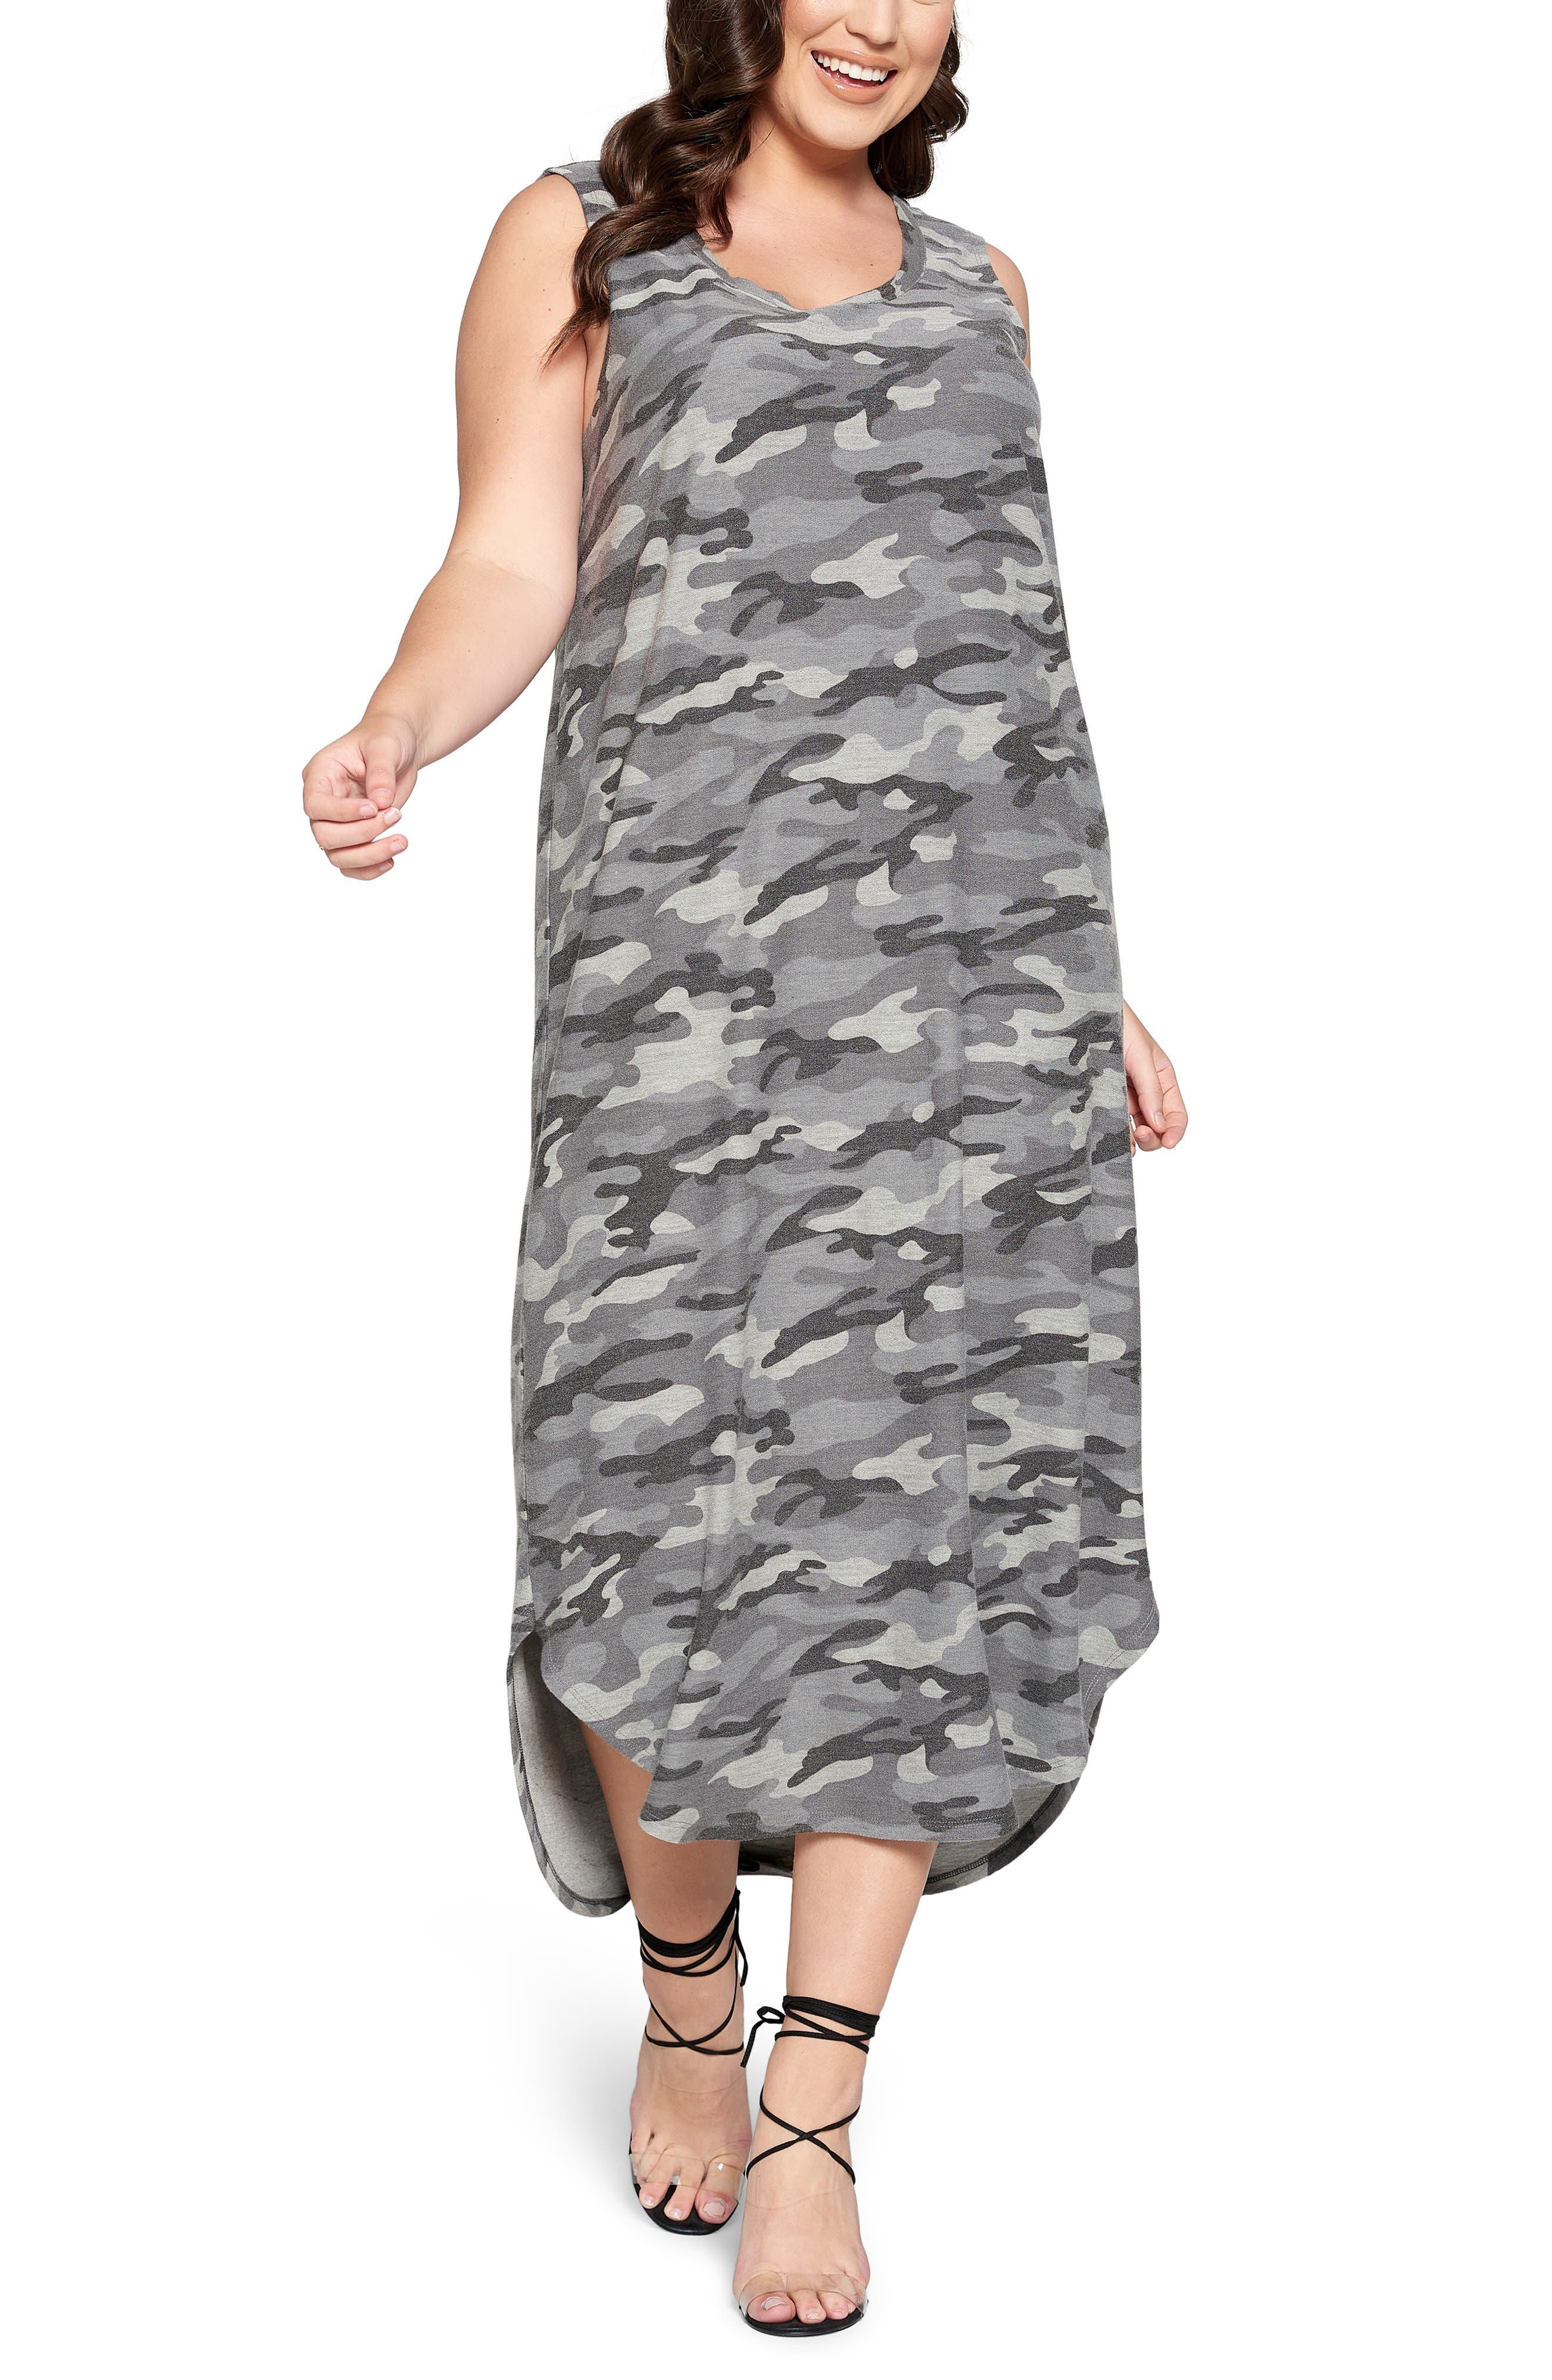 Camo Print Sleeveless Dress